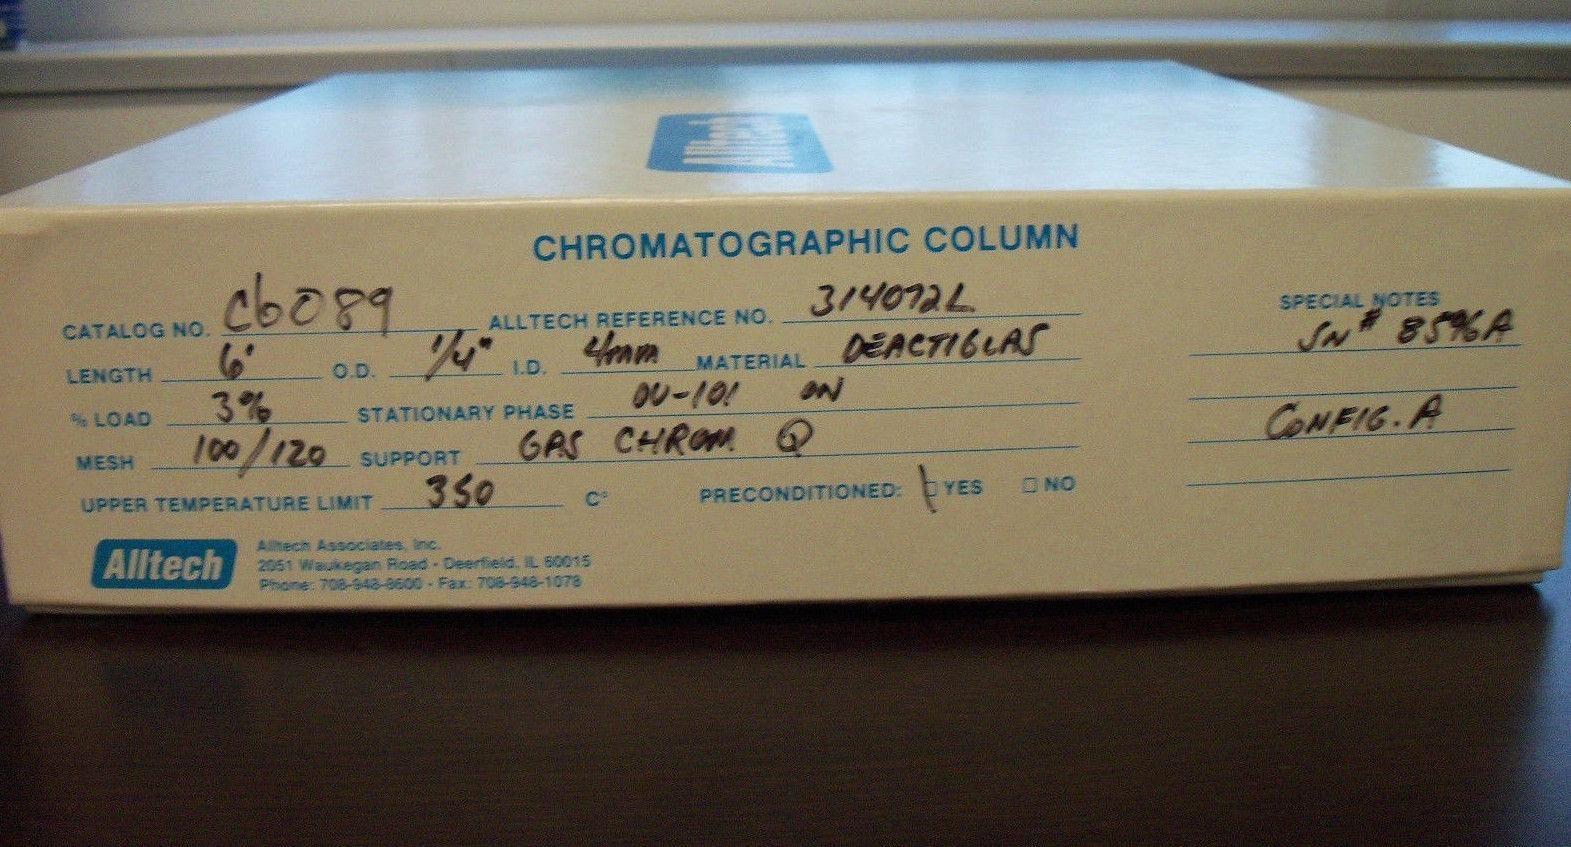 "Alltech # 314072L Deactiglas GC Column CAT # CB089: 6' Length OD 1/4"" ID 4mm"